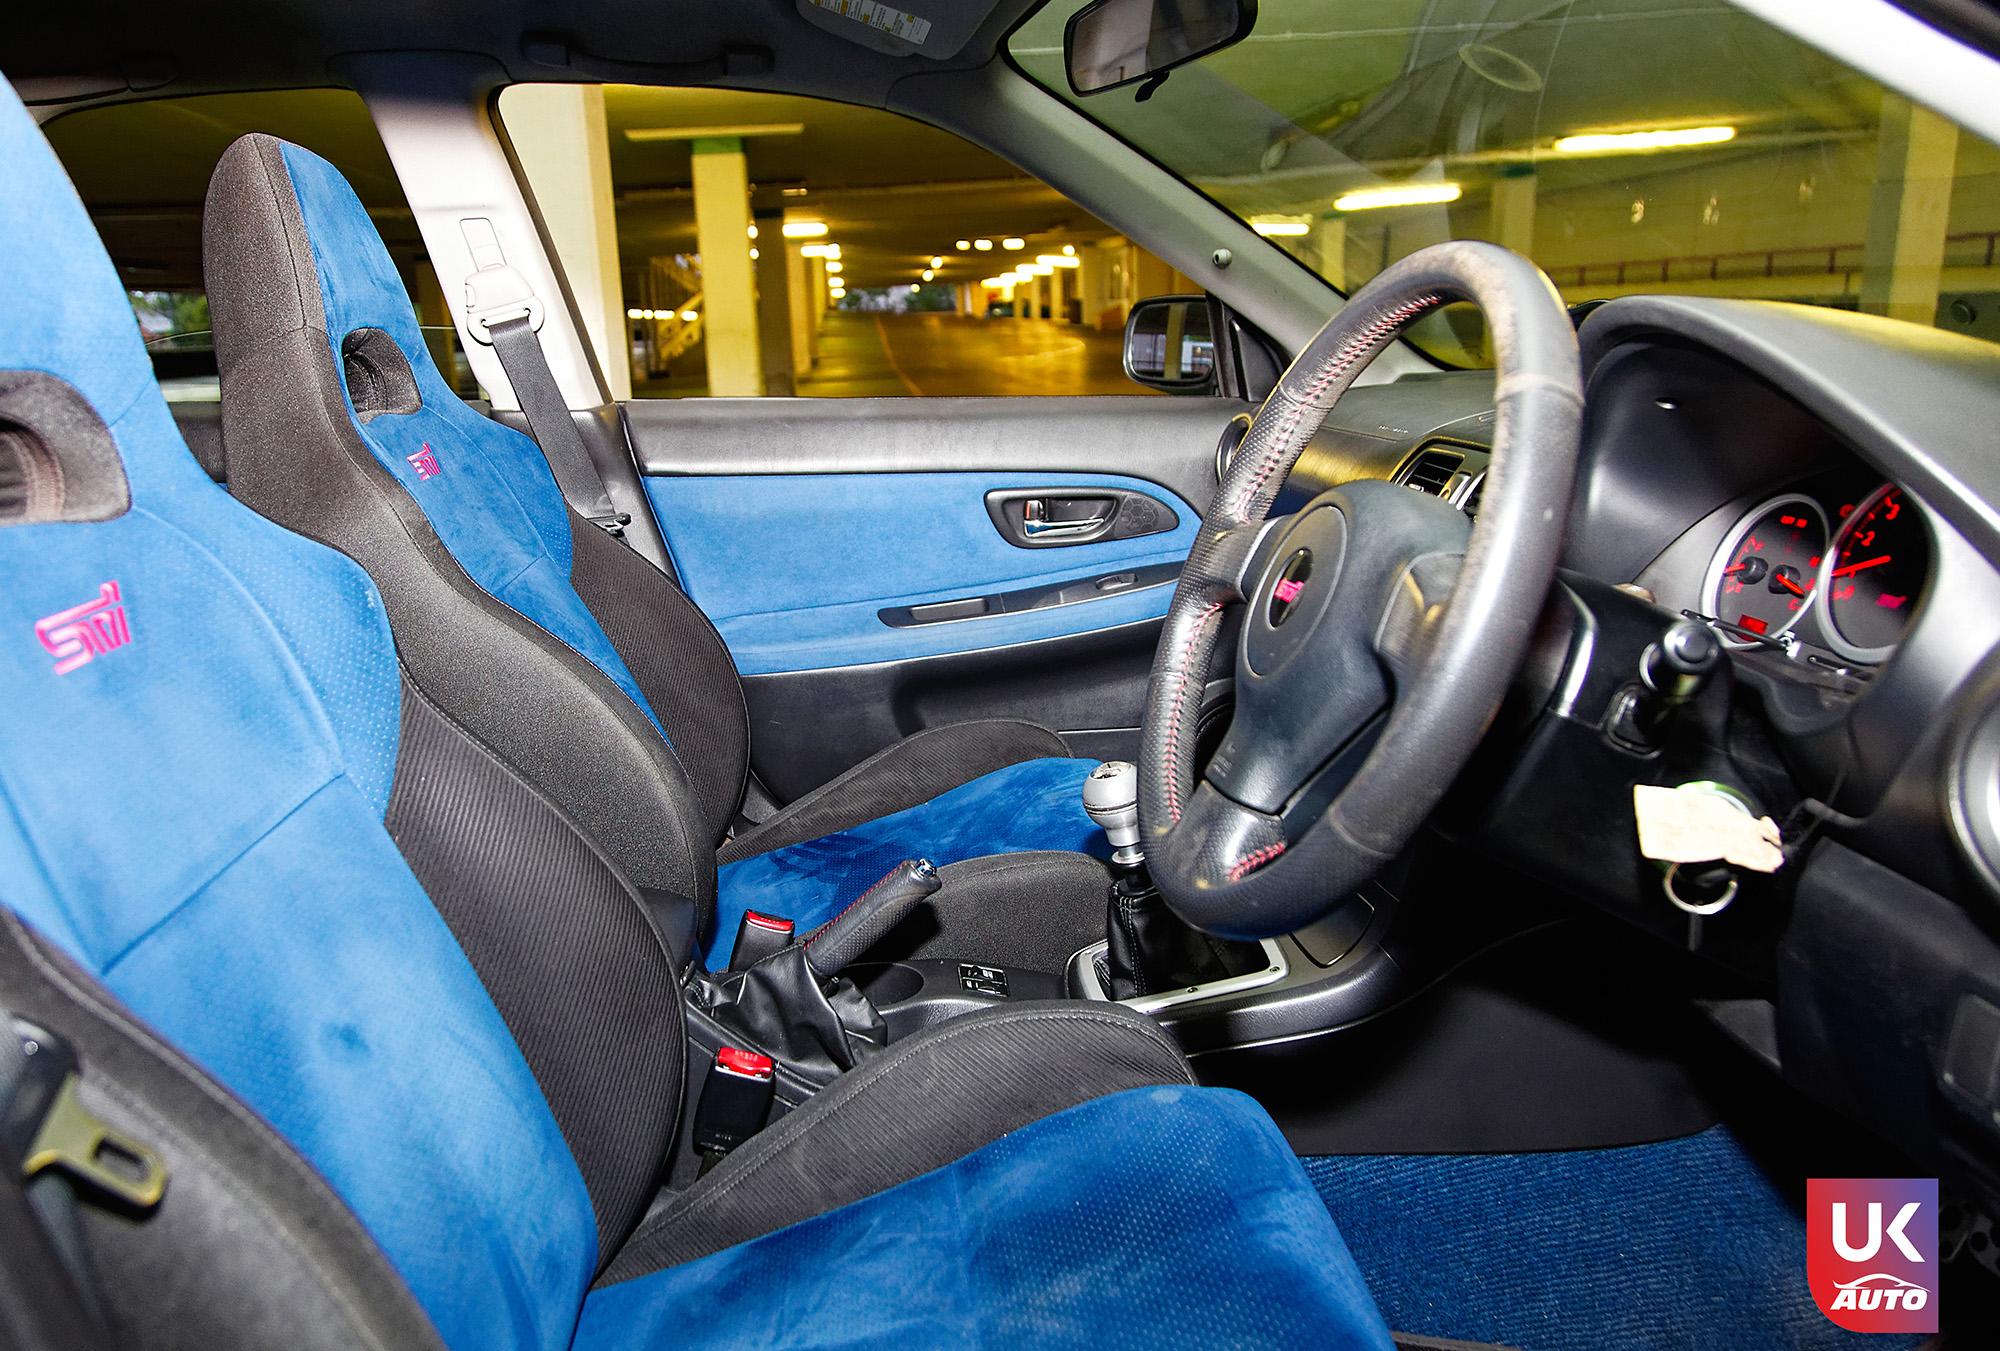 import subaru impreza wrx sti rhd import voiture angleterre auto import8 - Felecitation a Christophe pour cette Subaru Impreza Wrx Sti RHD Supercharged Importation voiture angleterre